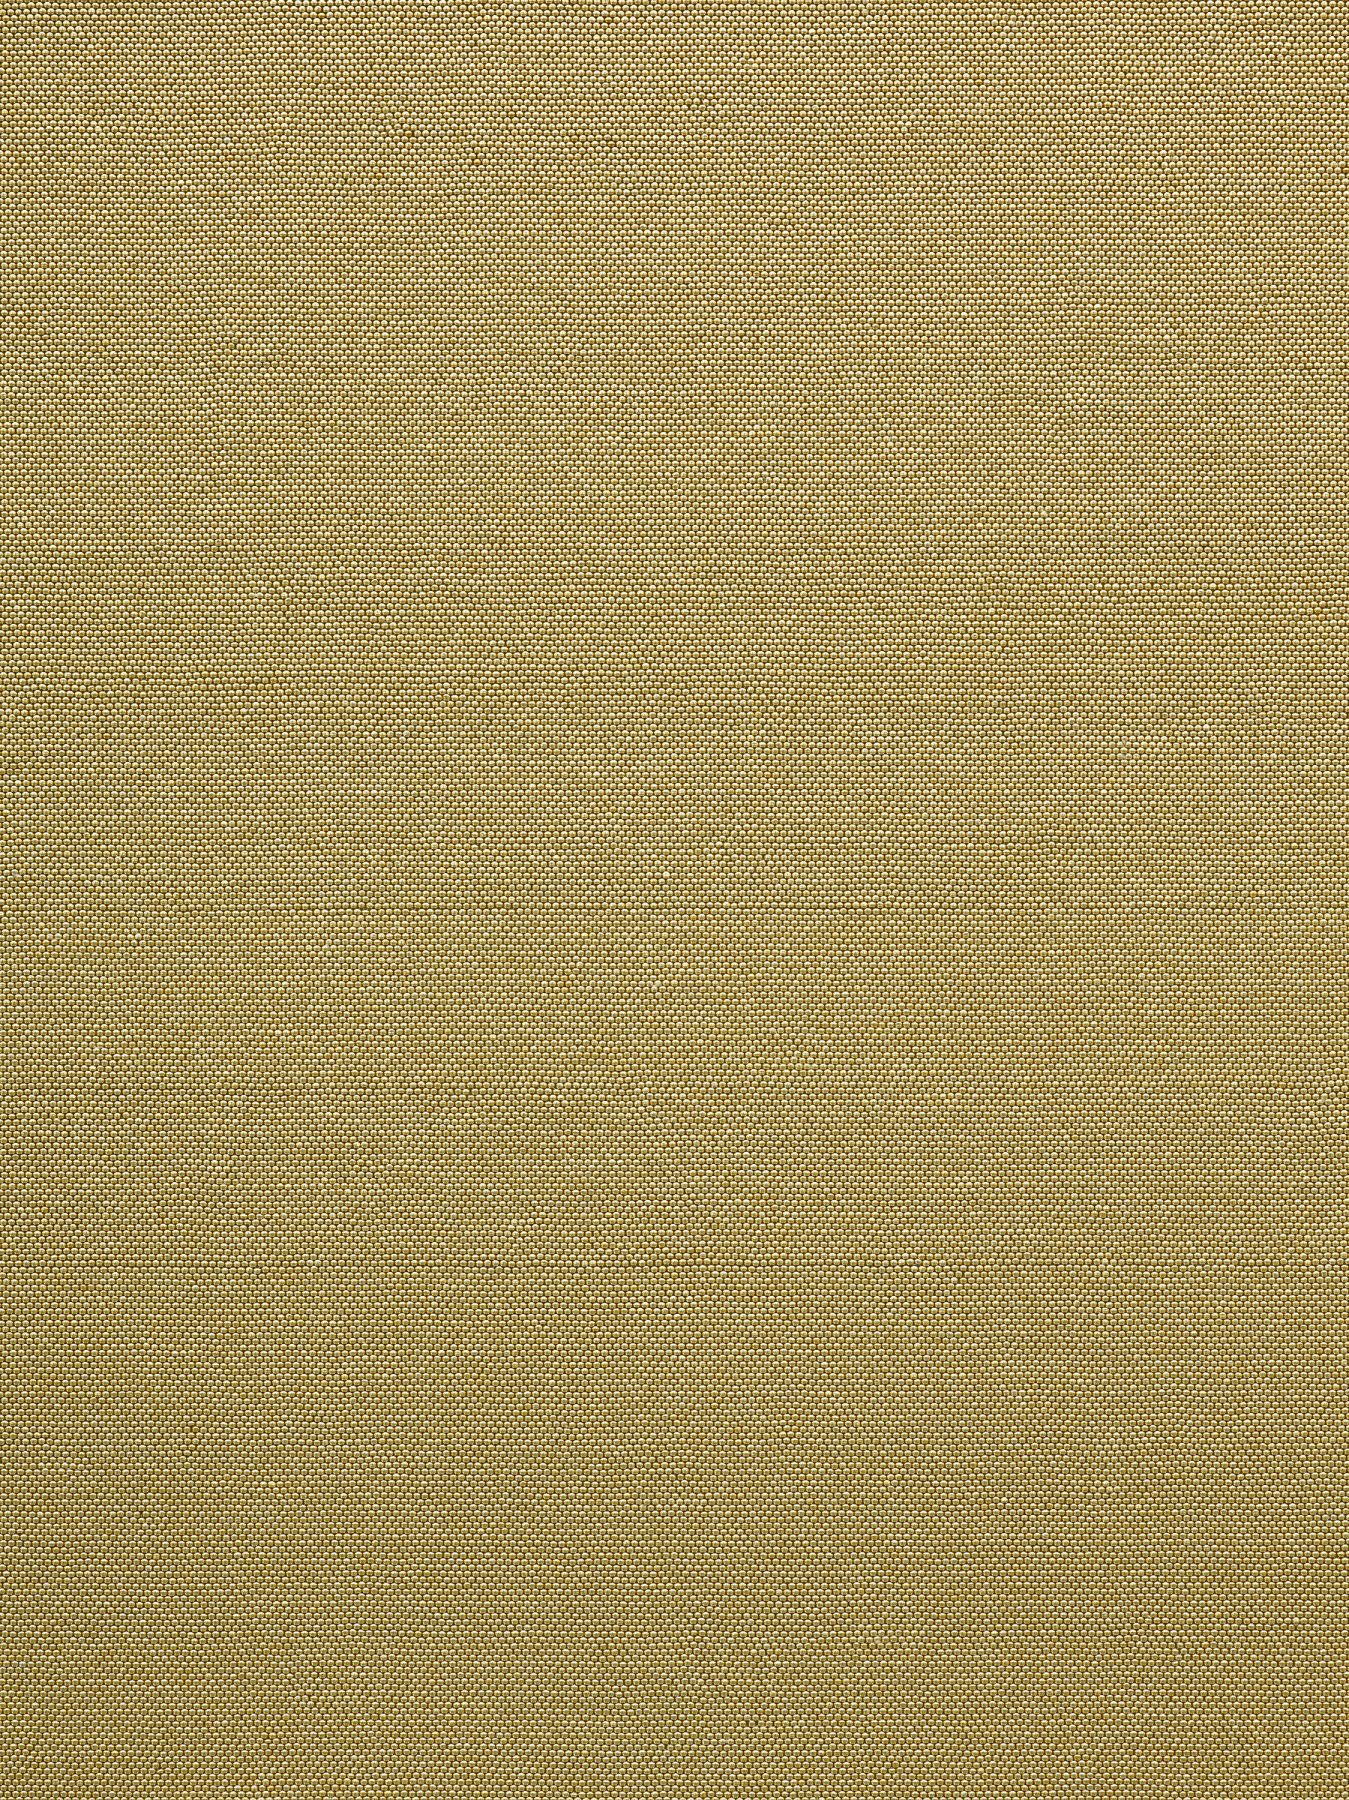 LIZA LOU Xanthic / Solid(detail),2012-14